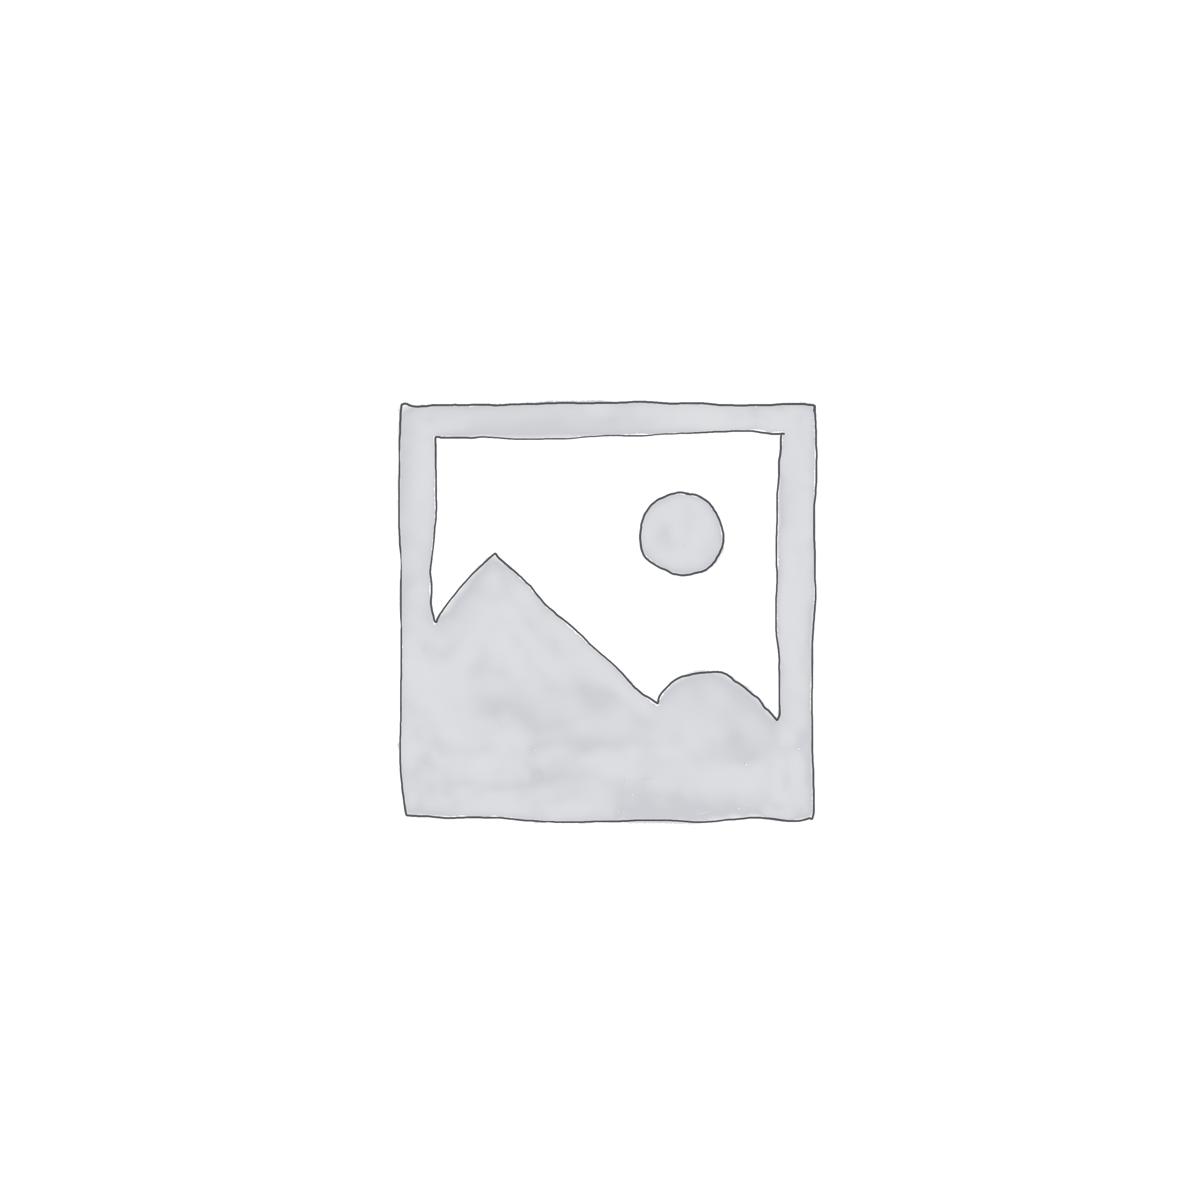 Art Nouveau Dark Floral Wallpaper Mural